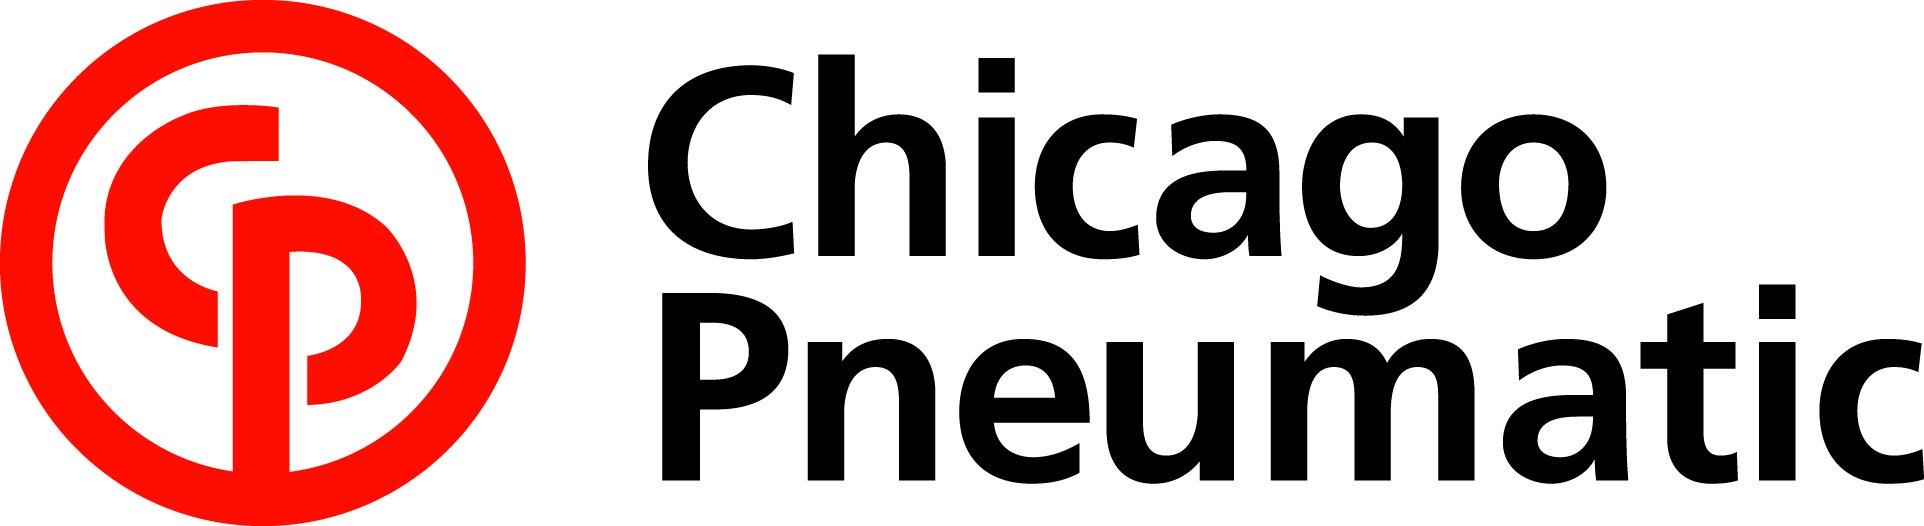 Chicago Pneumatic CP86300 30T WORKSHOP PRESS (8941086301)